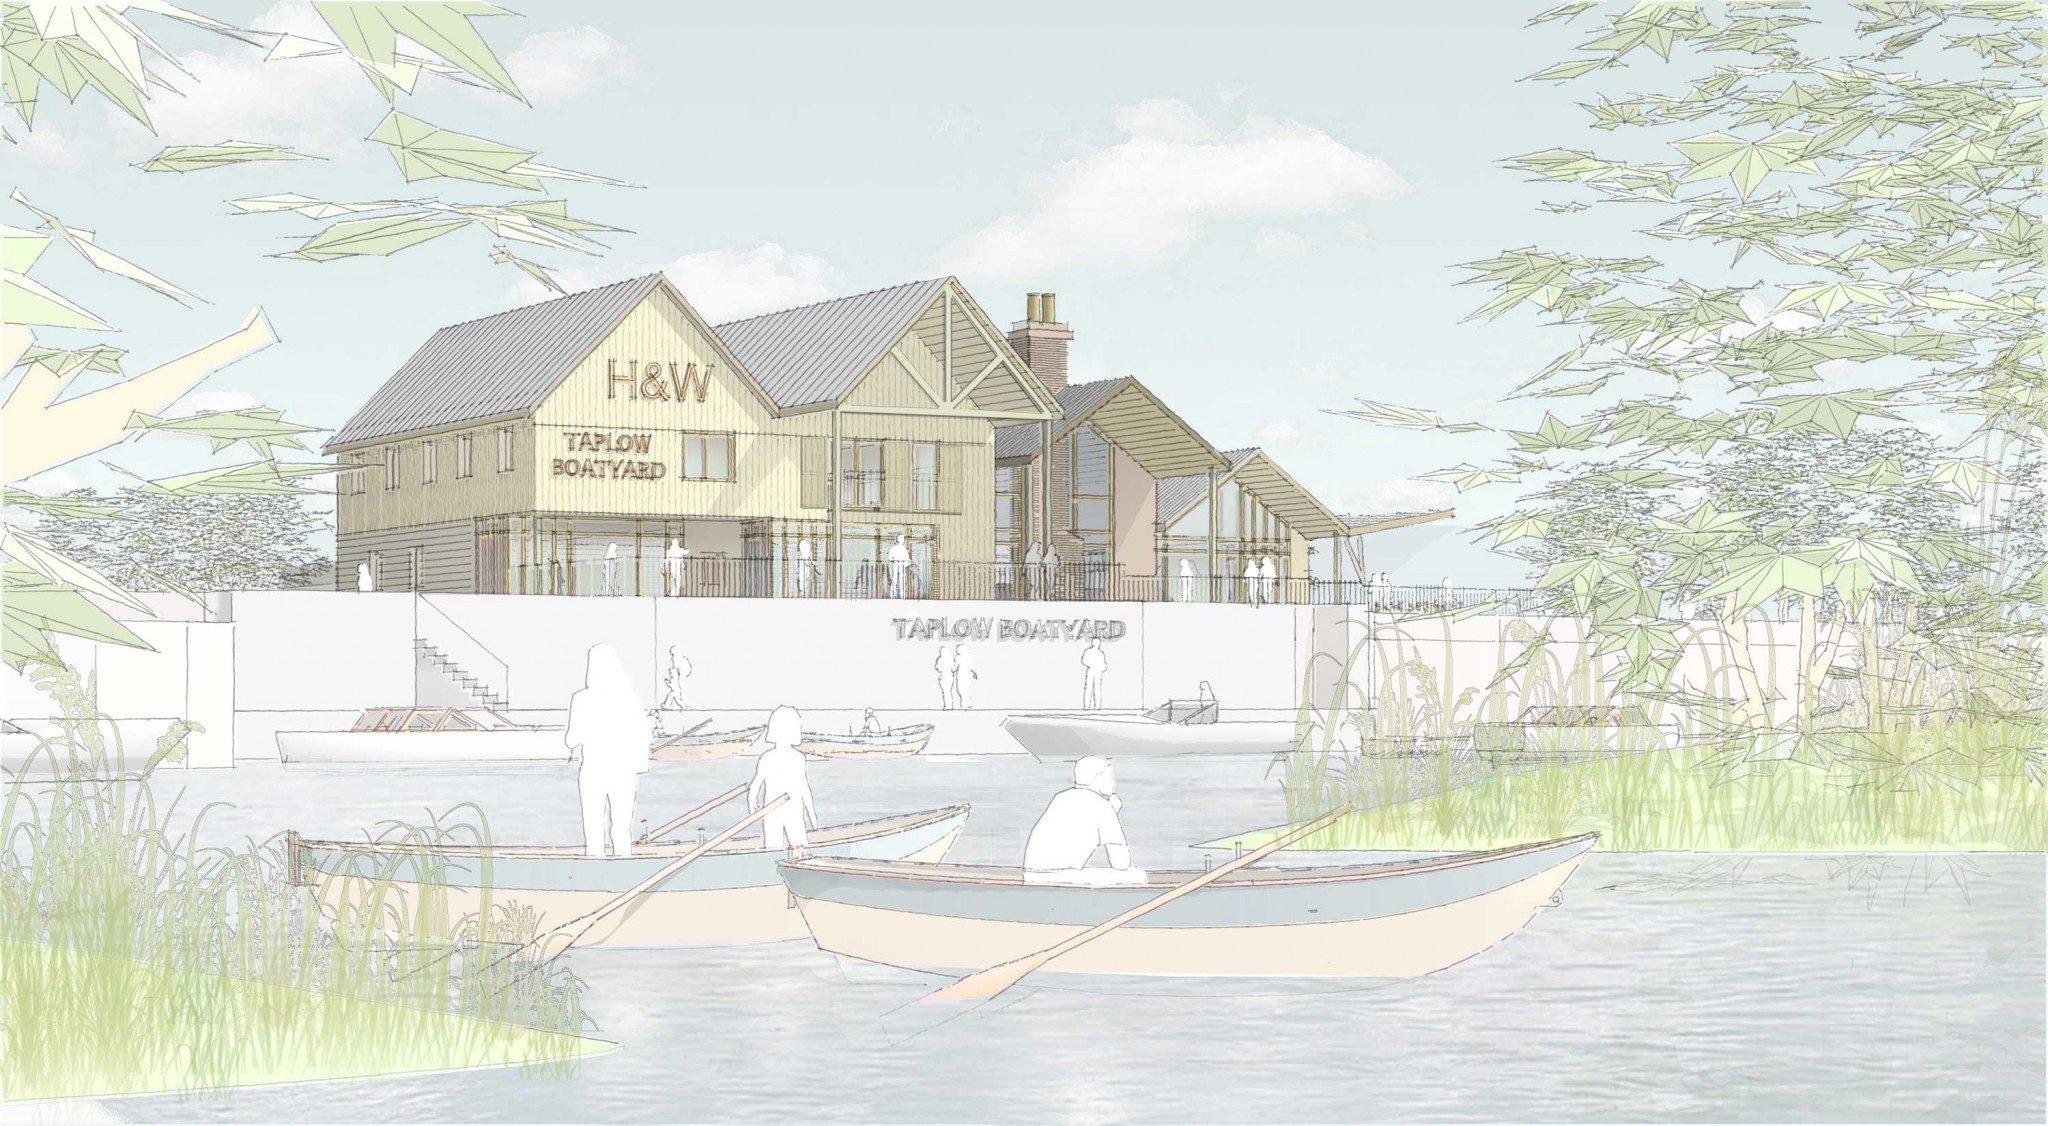 mackenzie wheeler are london based newbuild pub architects and interior designers specializing in riverside pub design